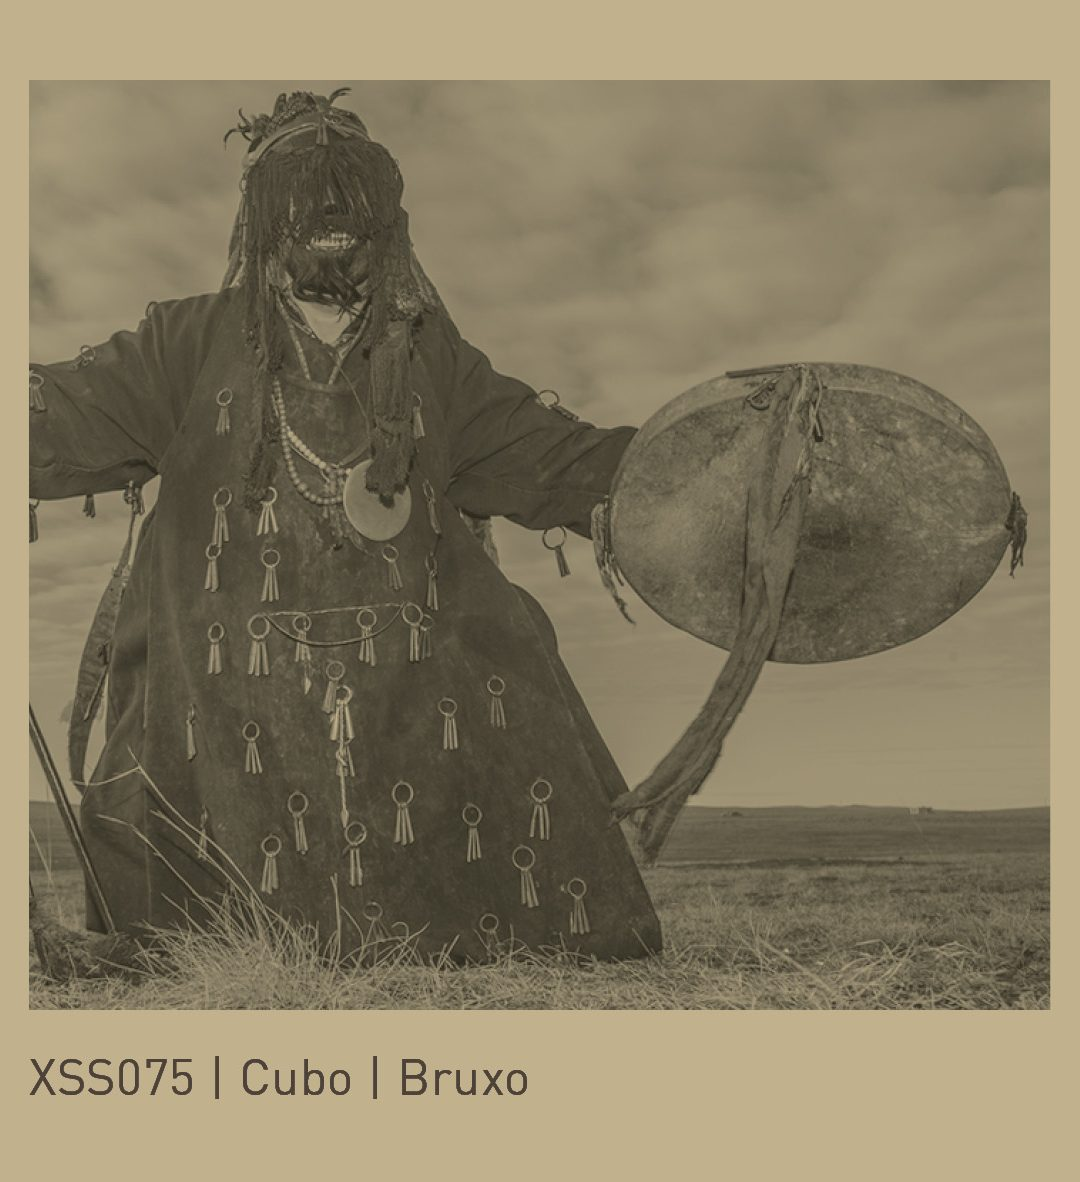 XSS075 | Cubo | Bruxo